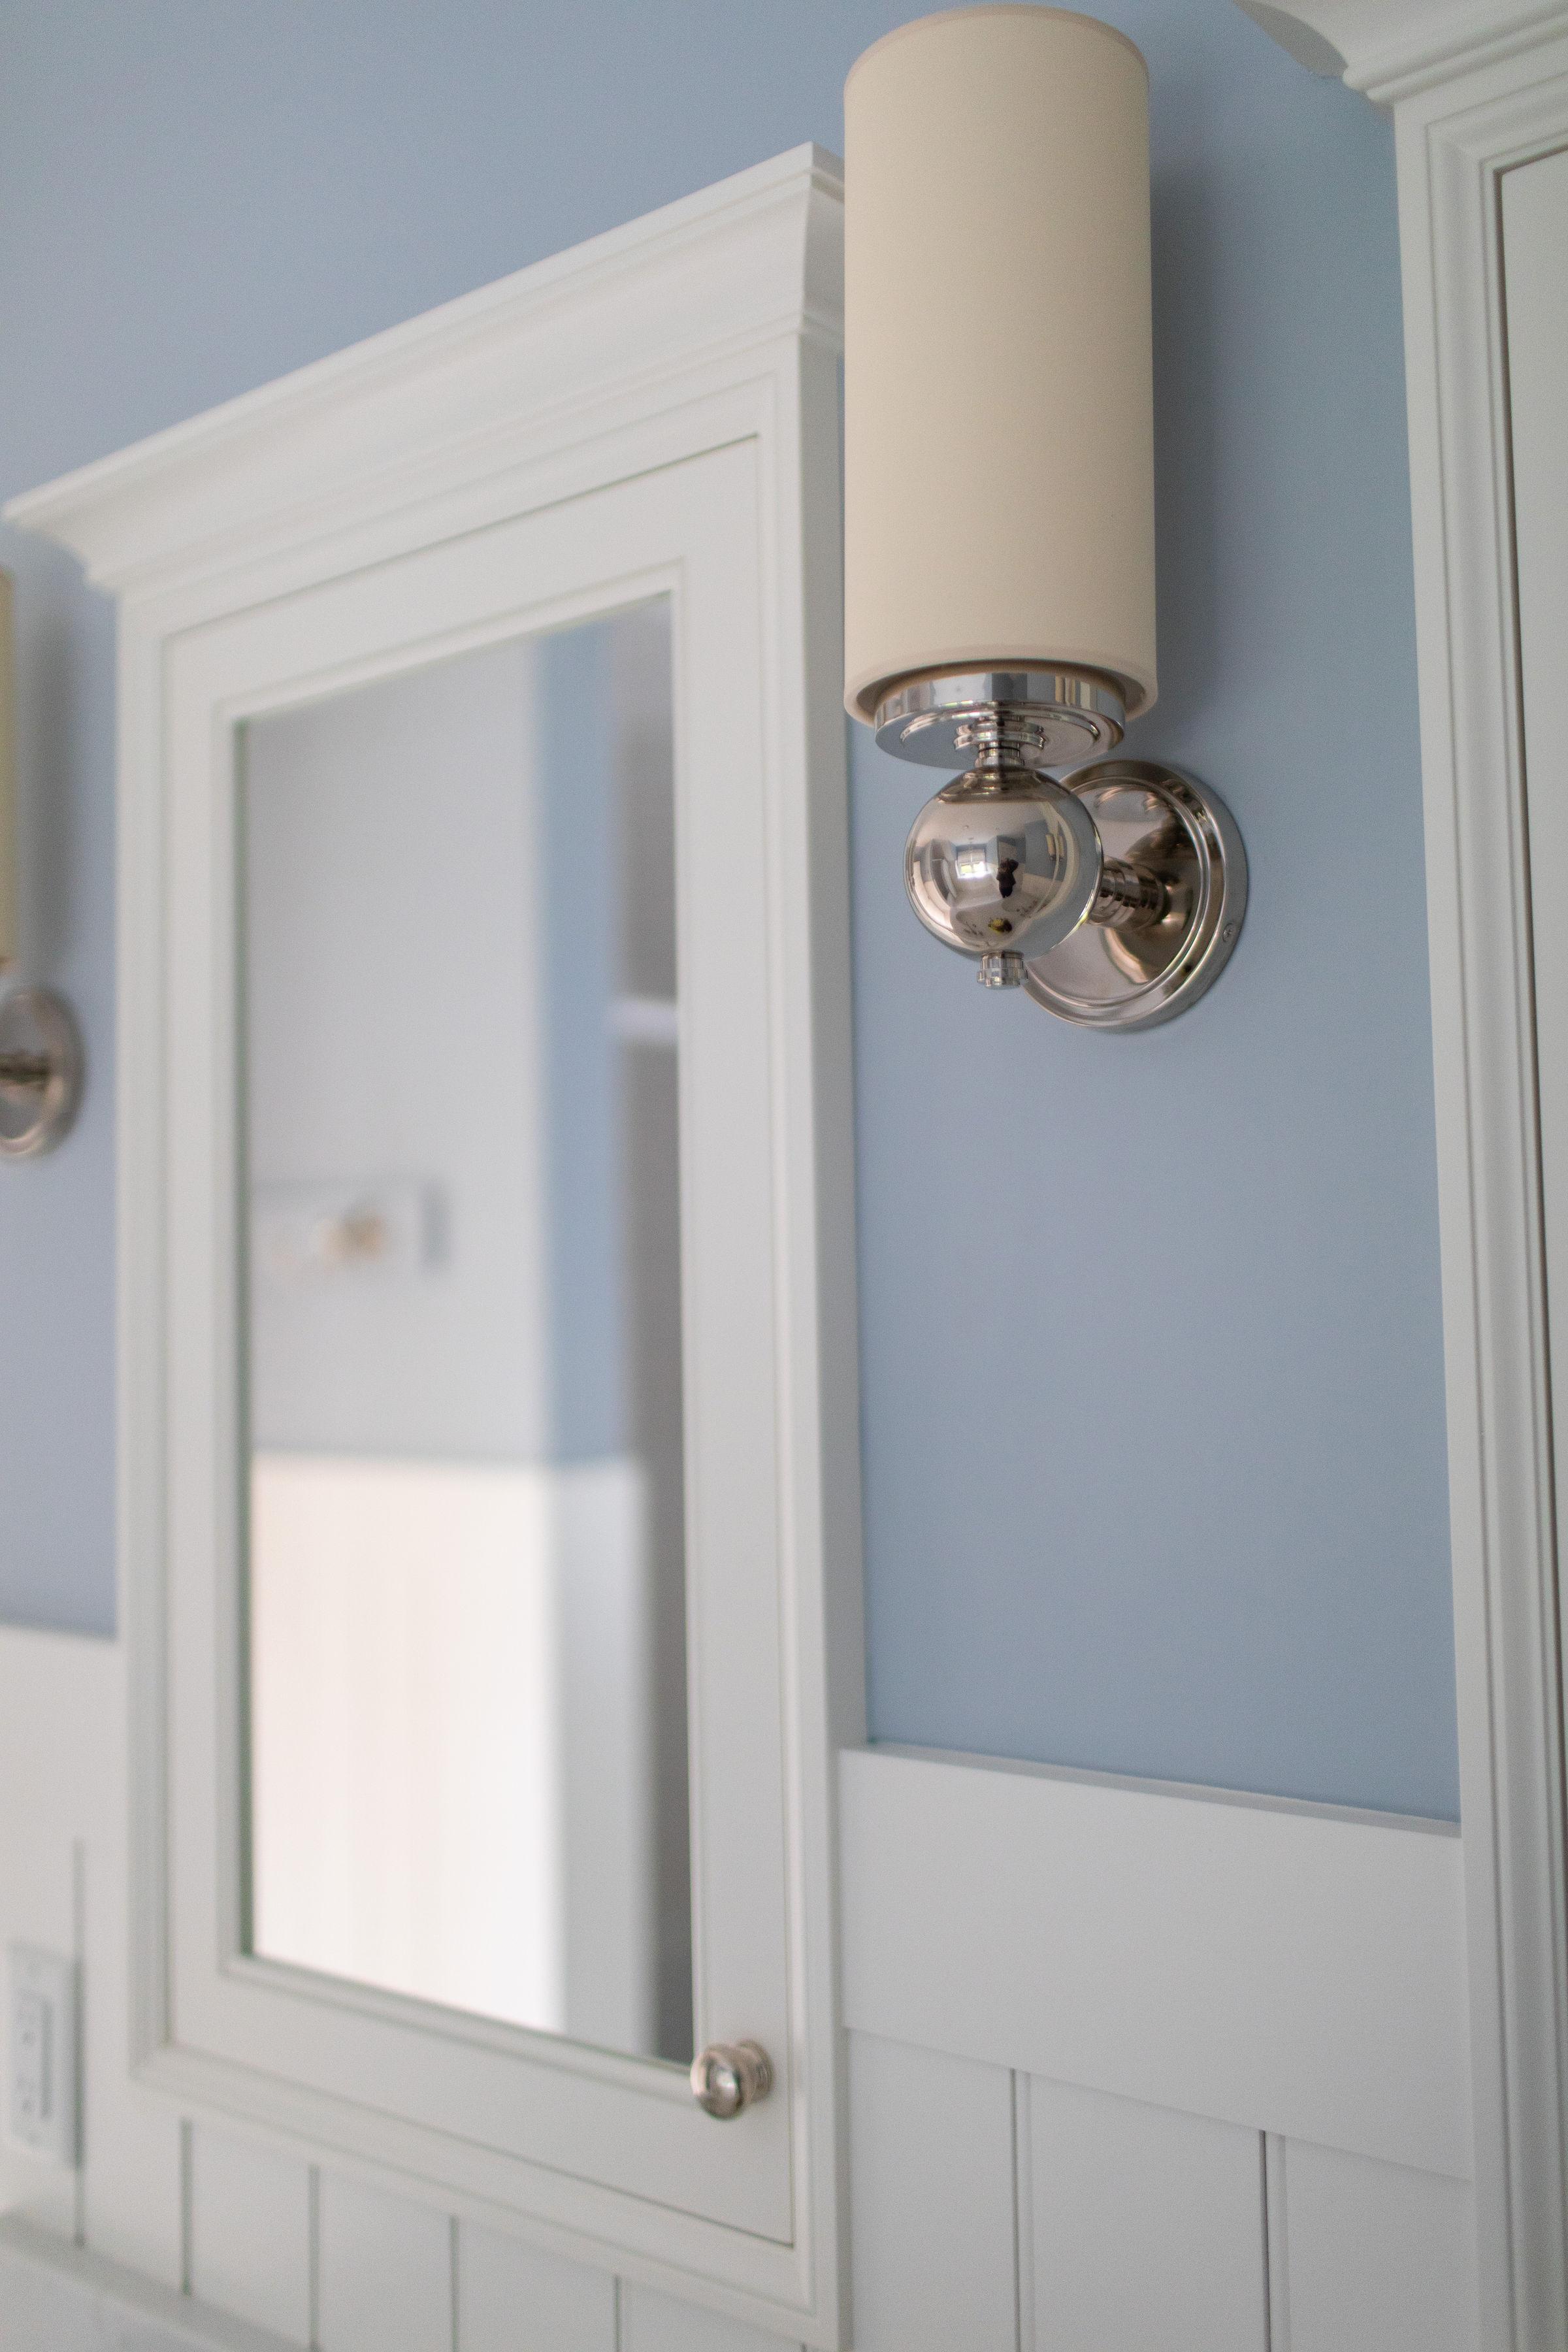 Bathroom-lighting-sconces